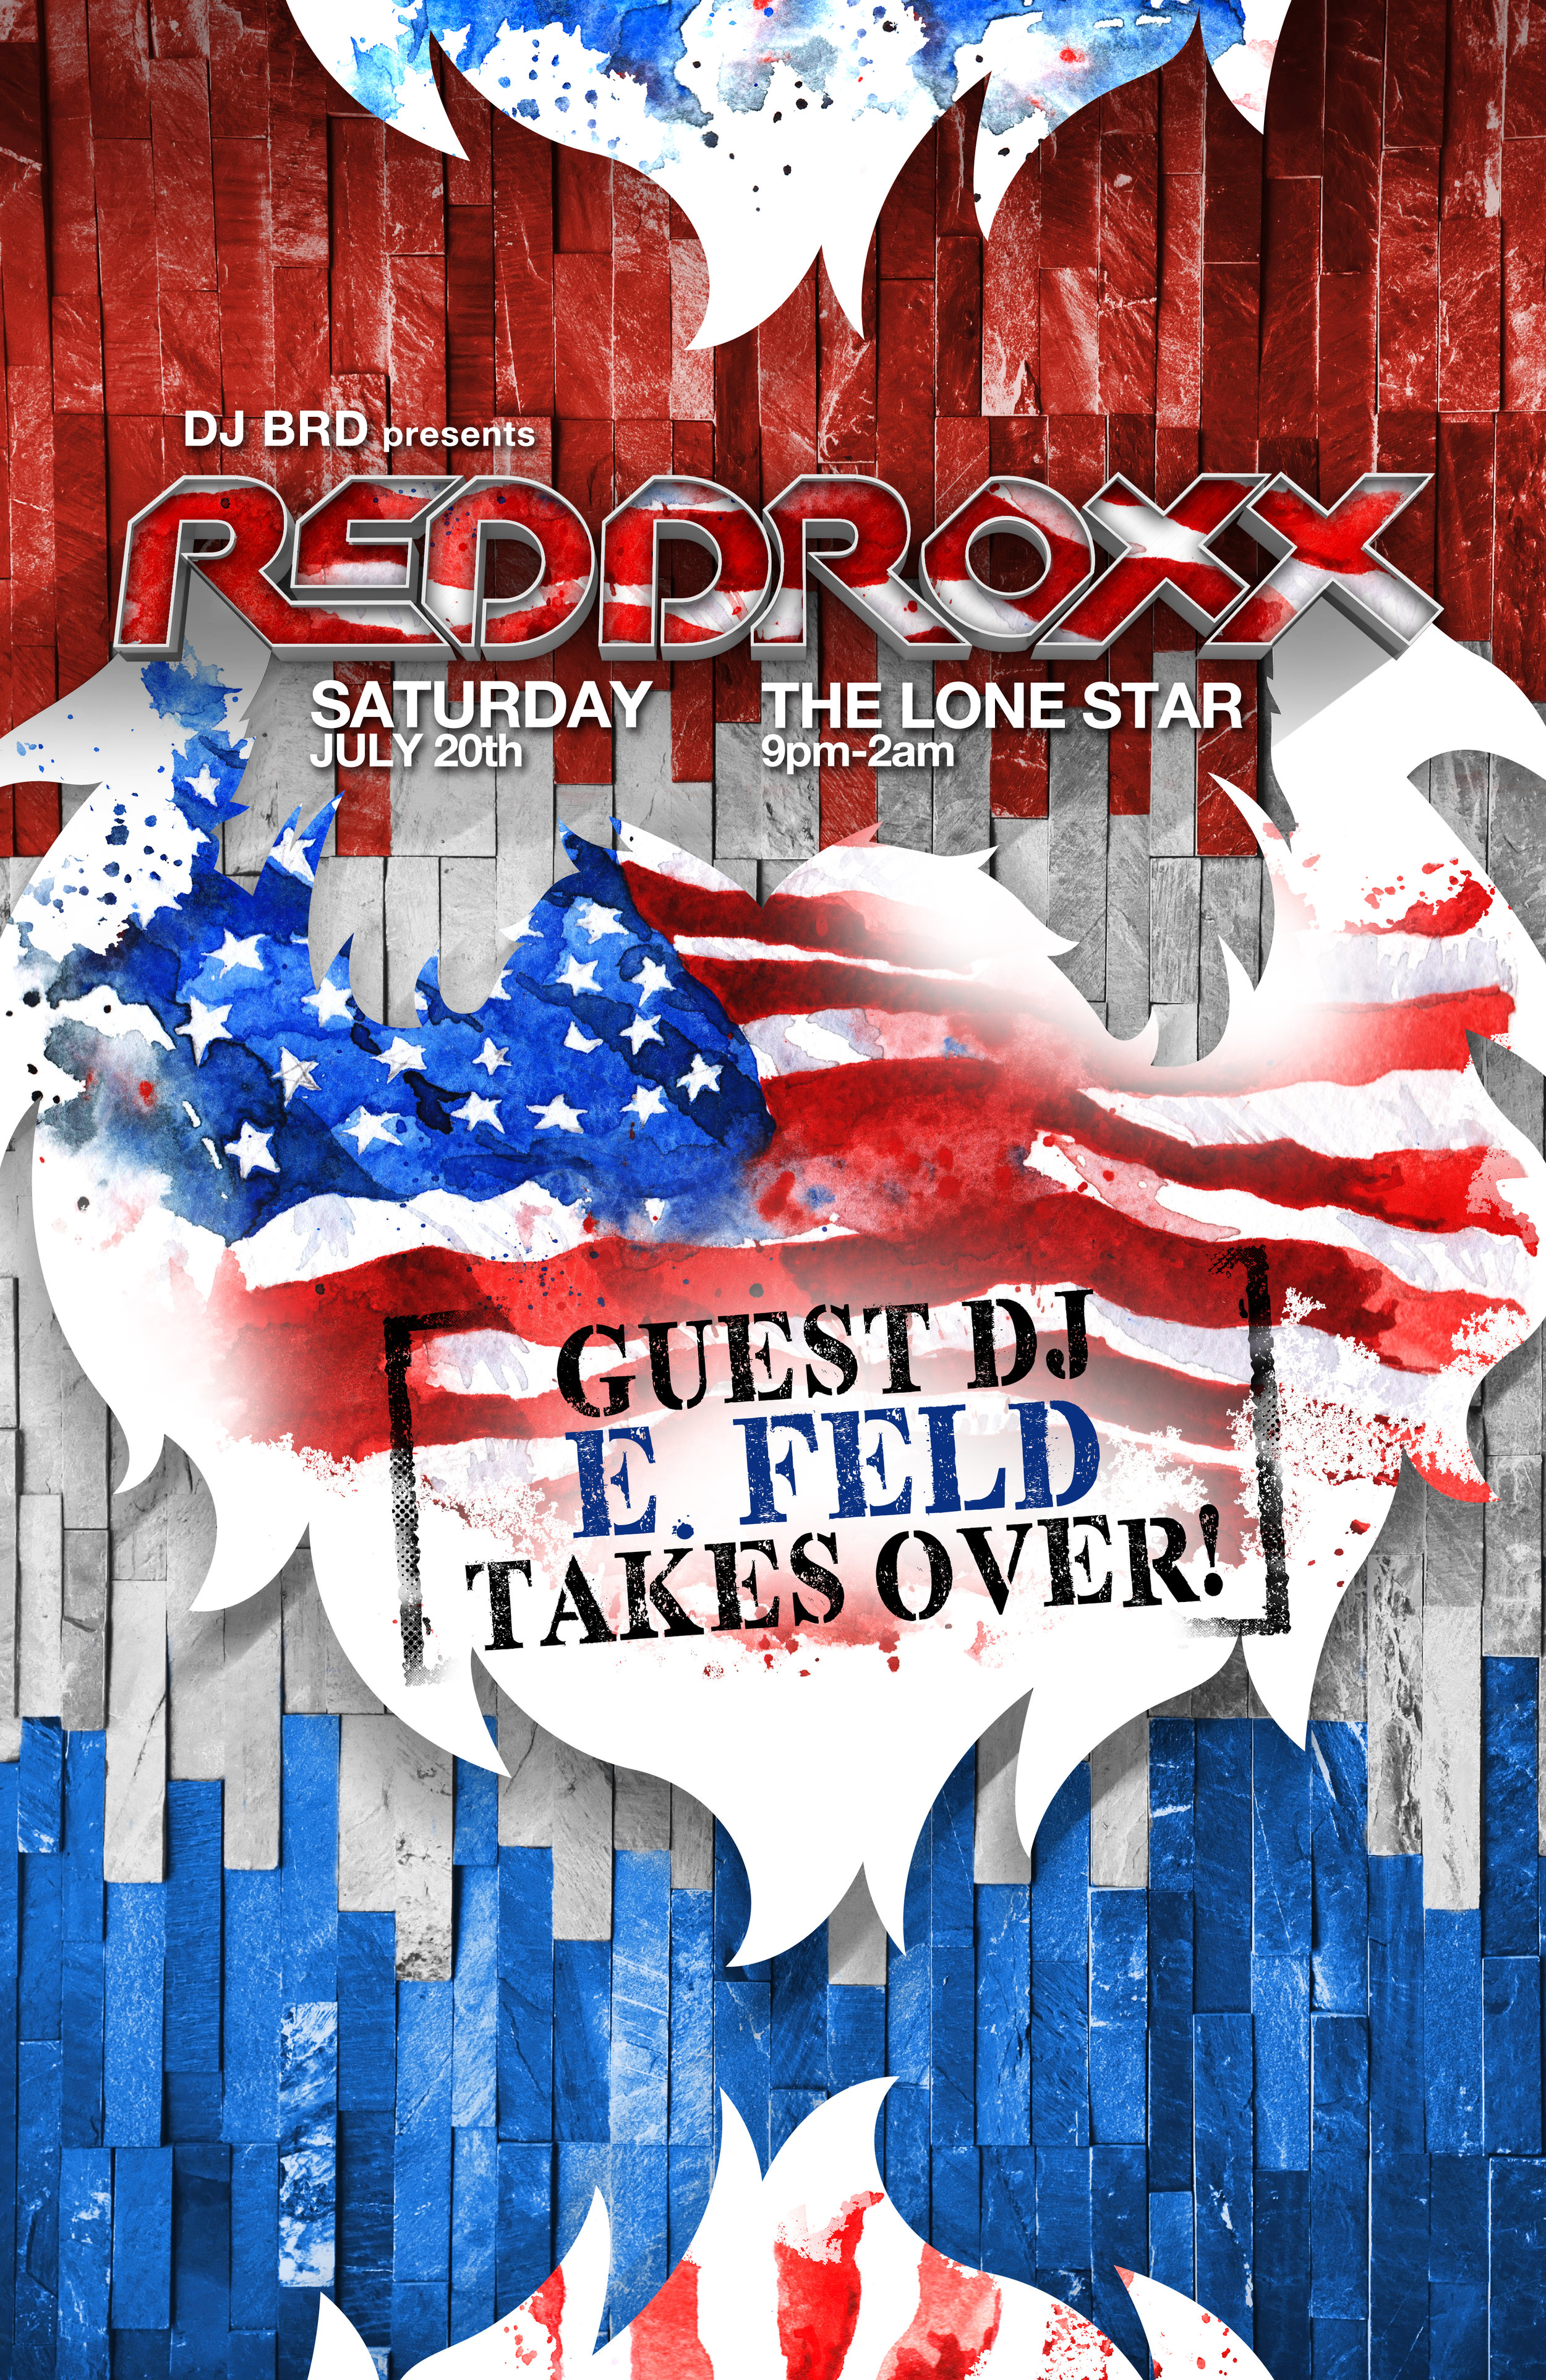 reddroxx_flyer88_11x17.jpg